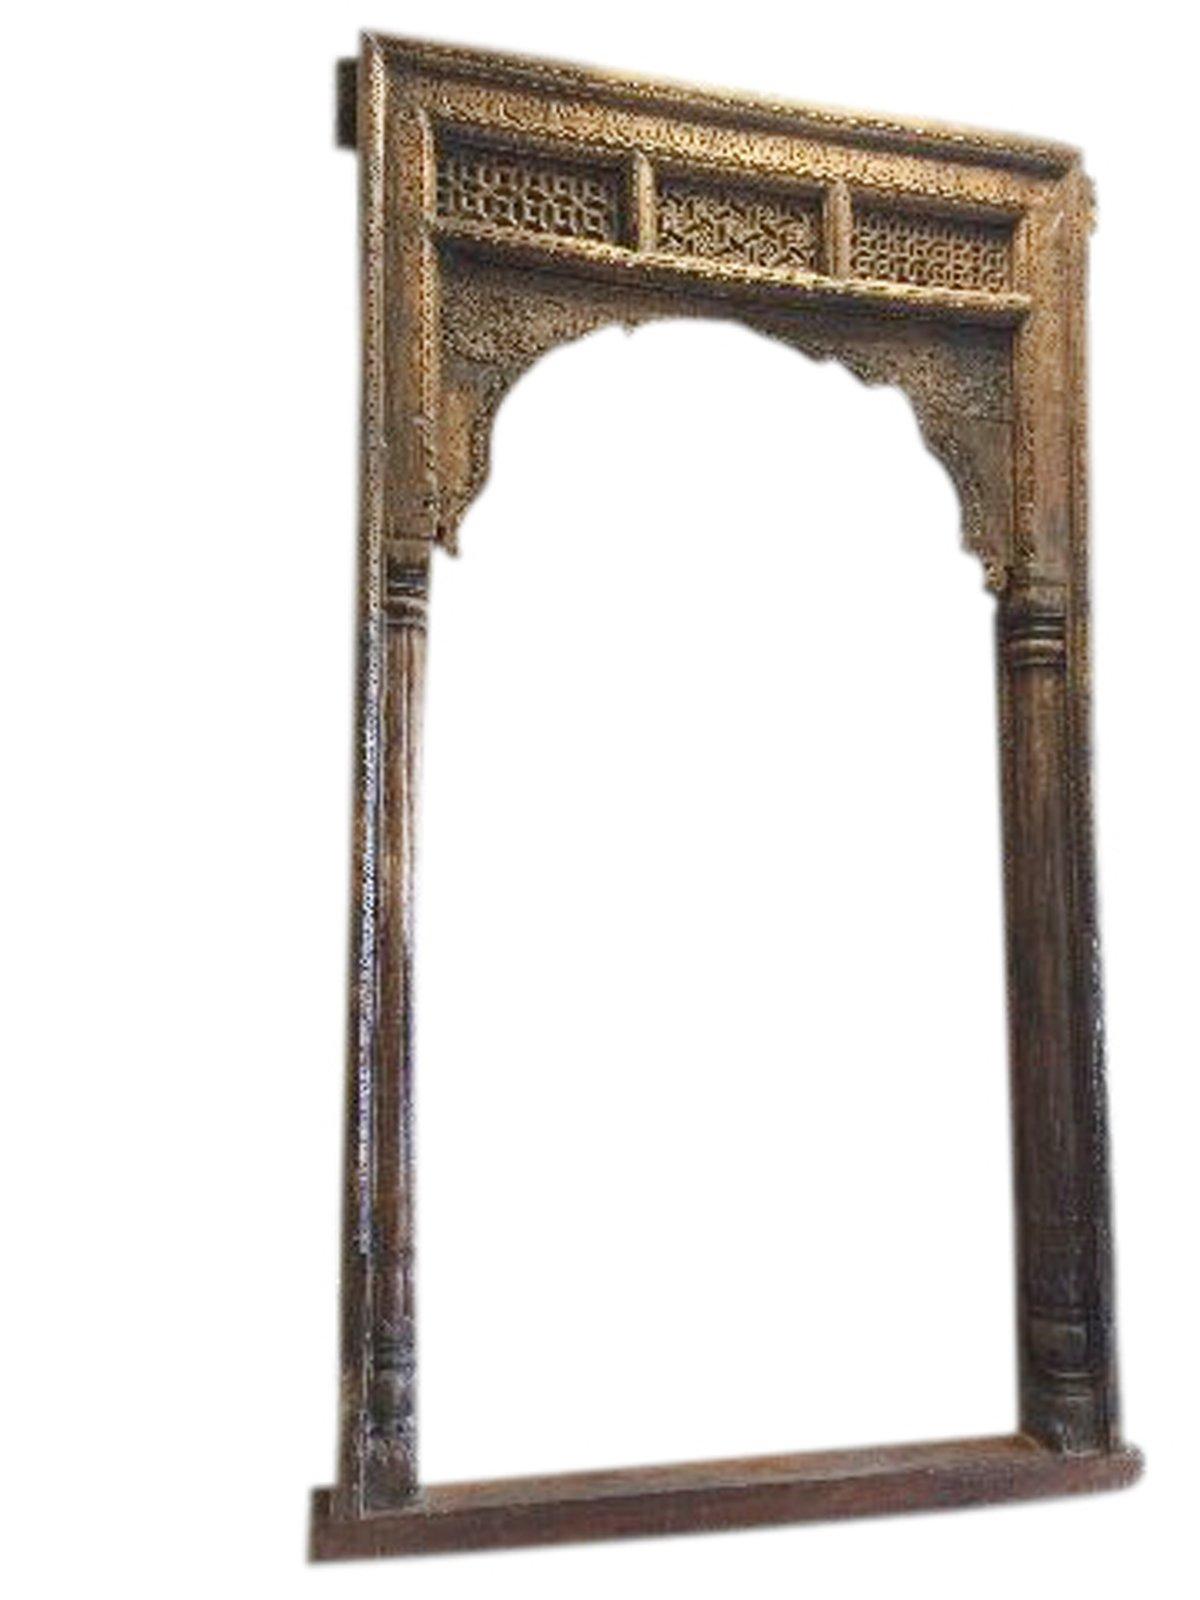 Antique Arch sHEKHWATI Teak Welcome Gate Headboard Hand Carved Vintage OLd World Architectural Design